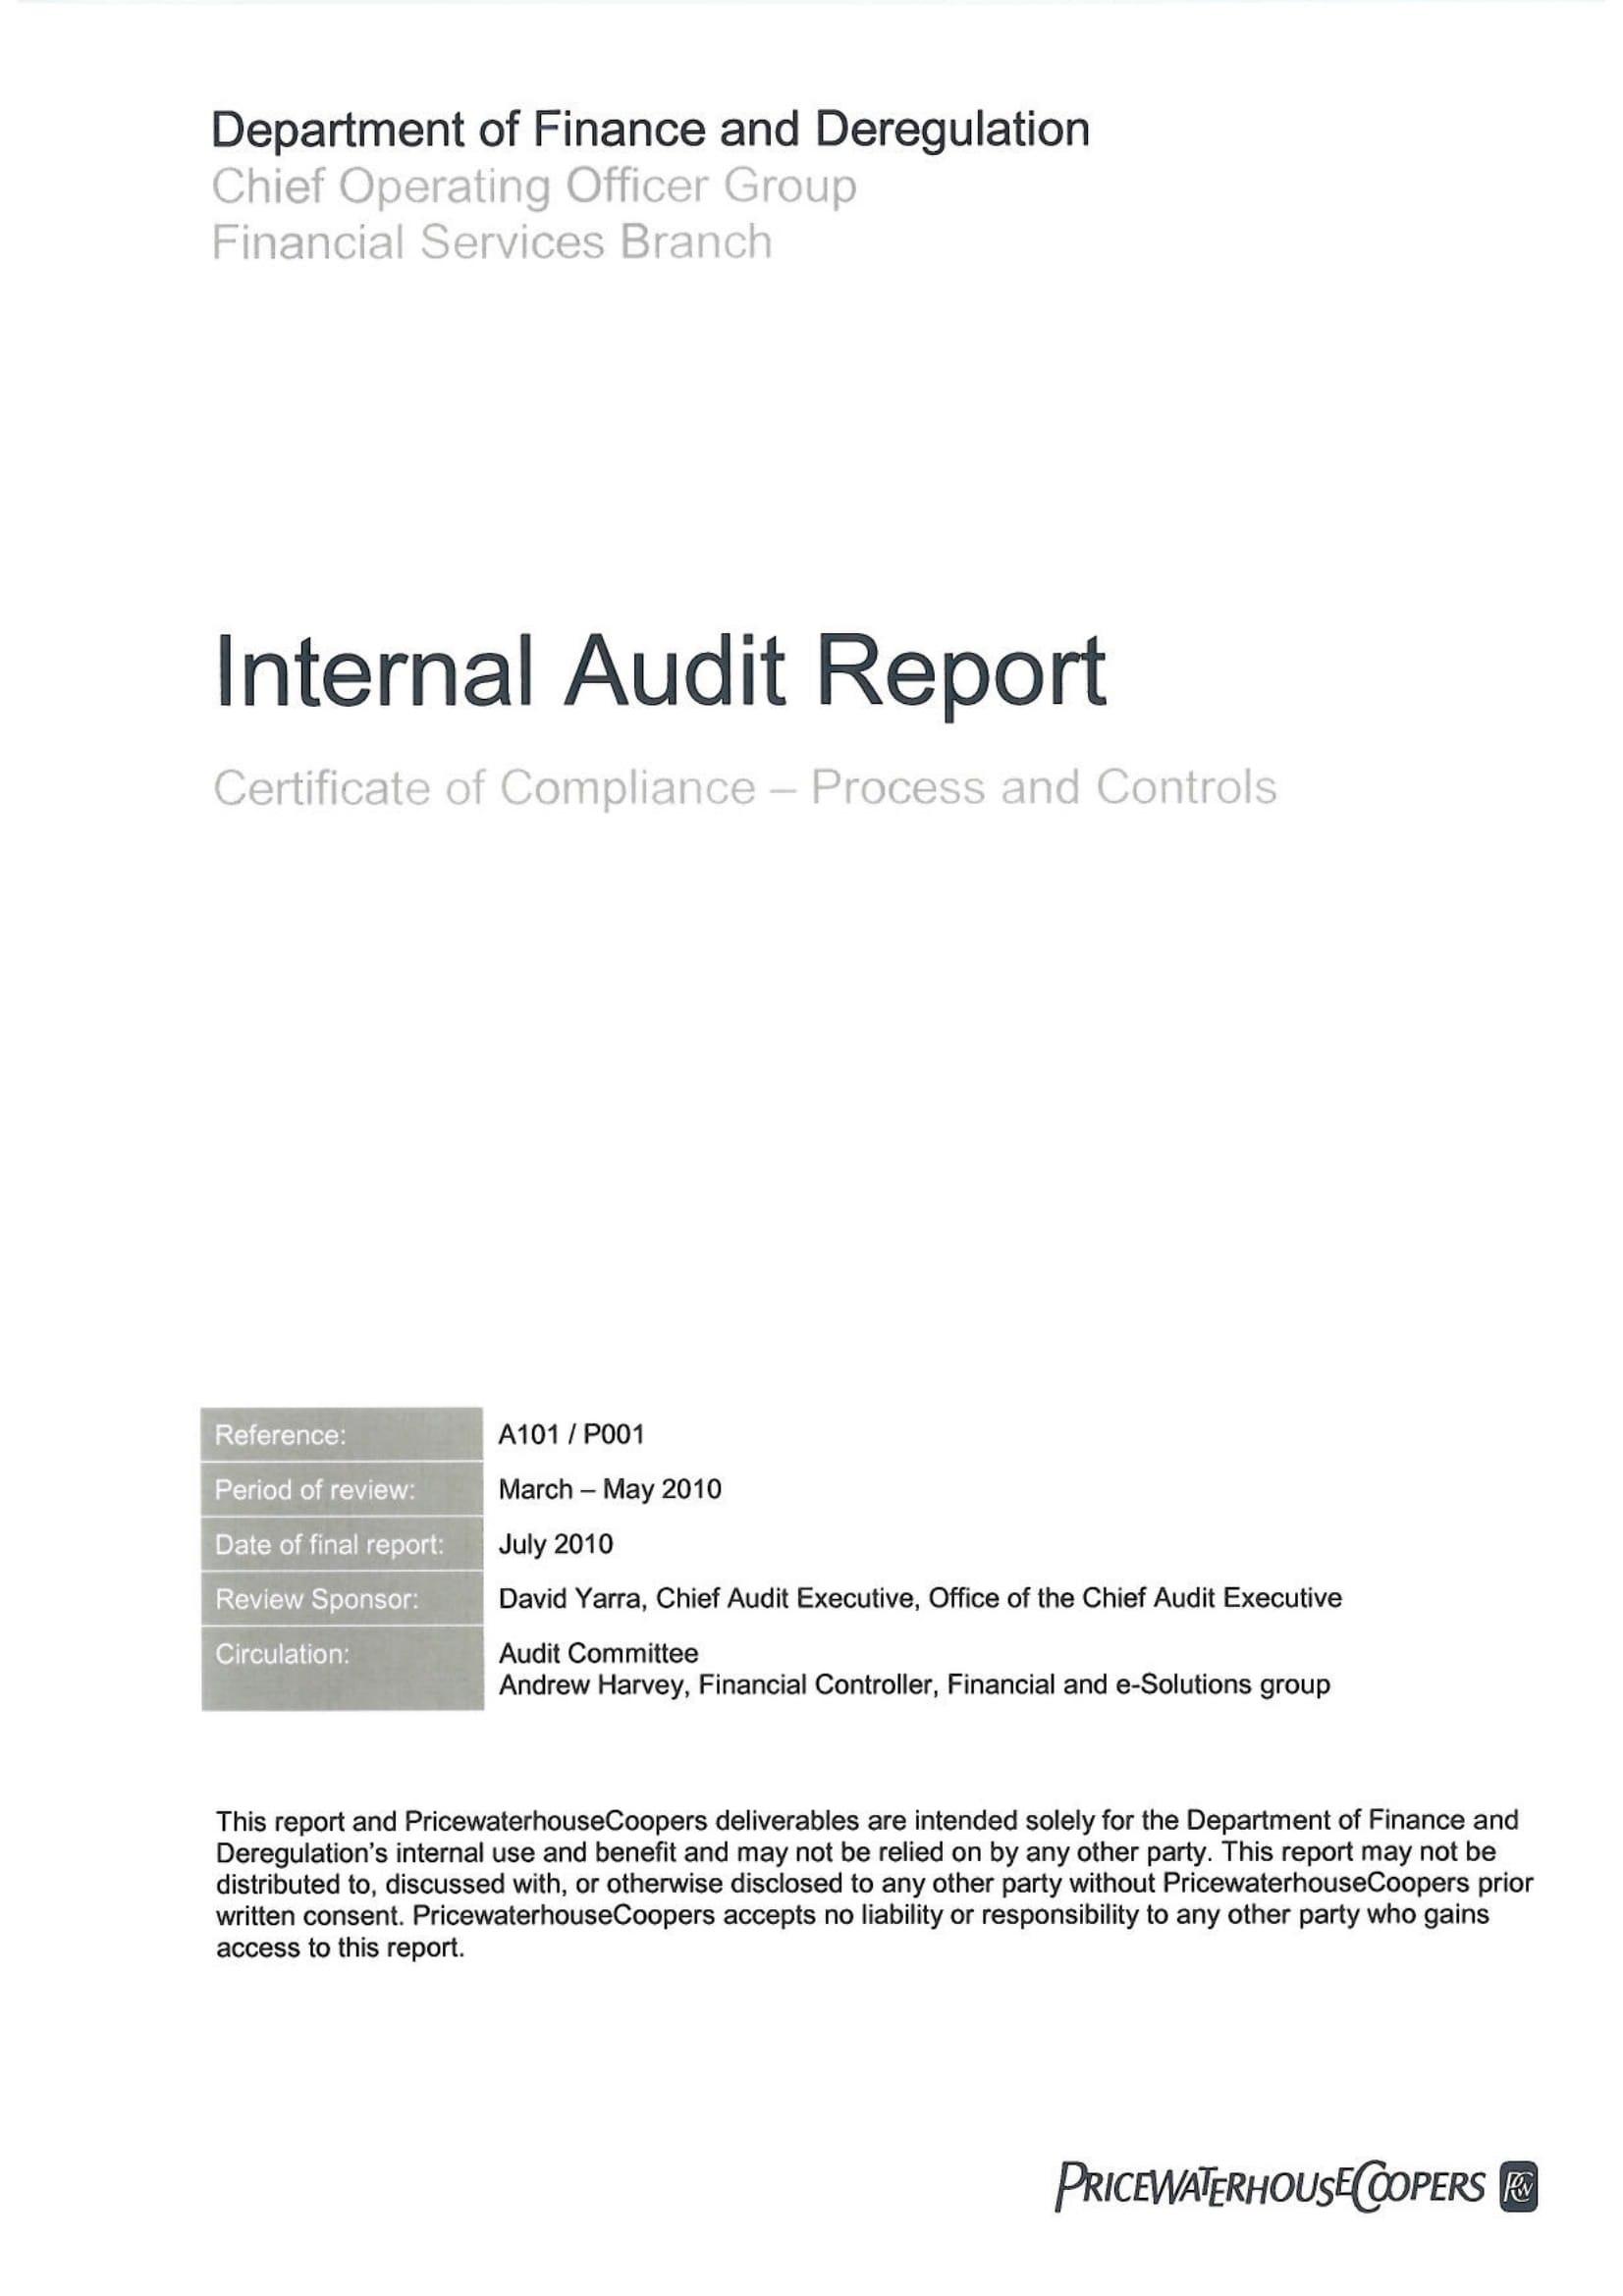 Internal Audit Report Examples  Pdf Word  Examples Intended For Internal Control Audit Report Template